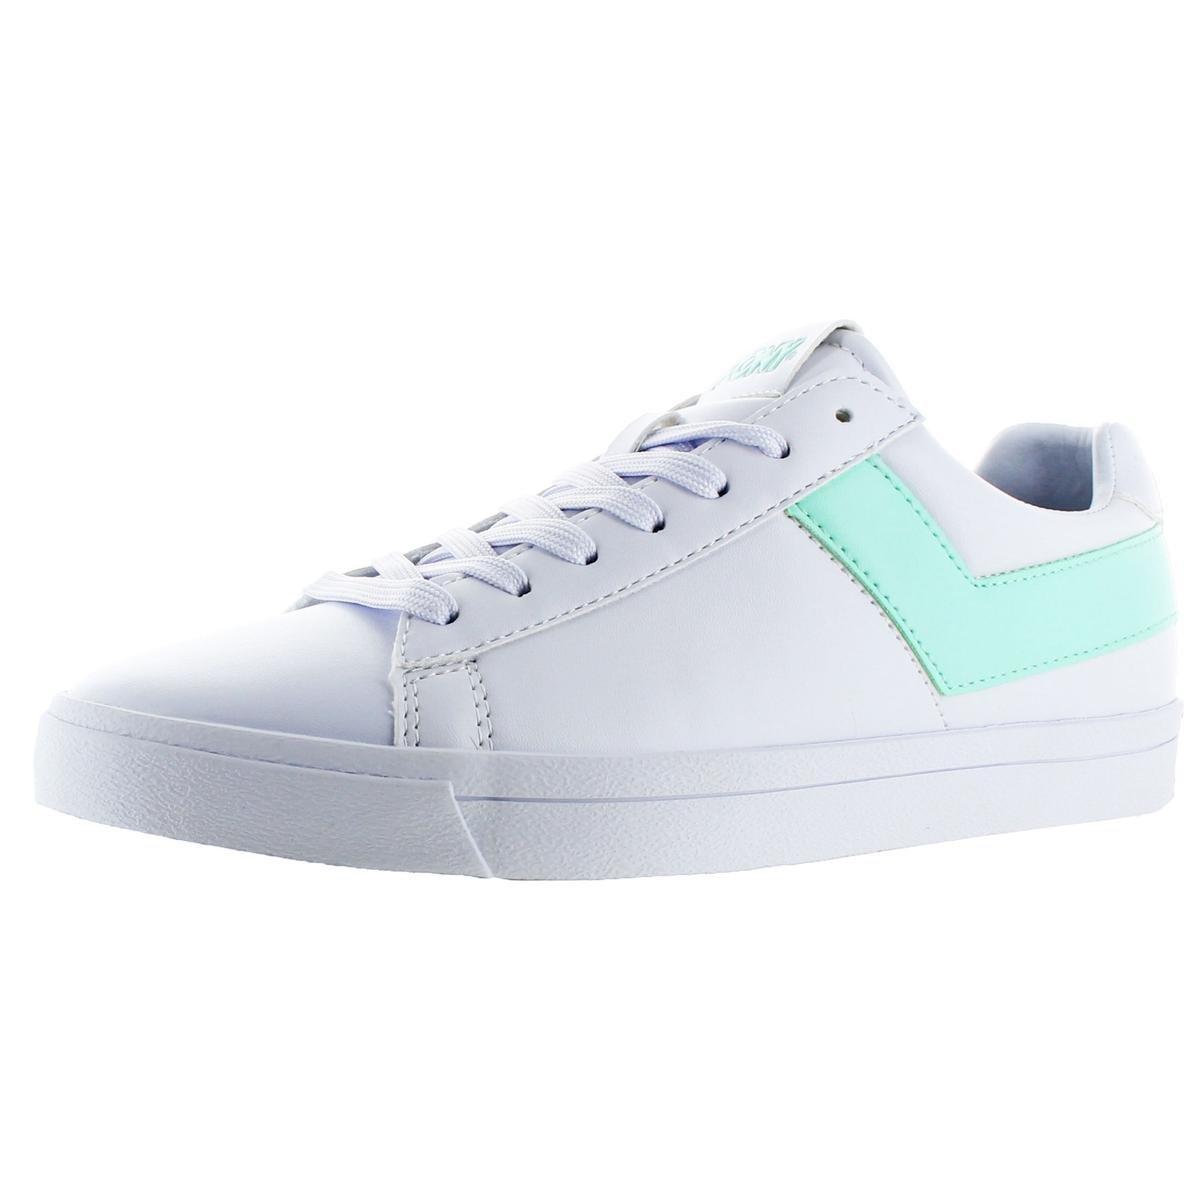 Pony Top Star Core Women's Retro Fashion Sneaker Shoes B07CR2BLKC 7.5 M US|White/Mint